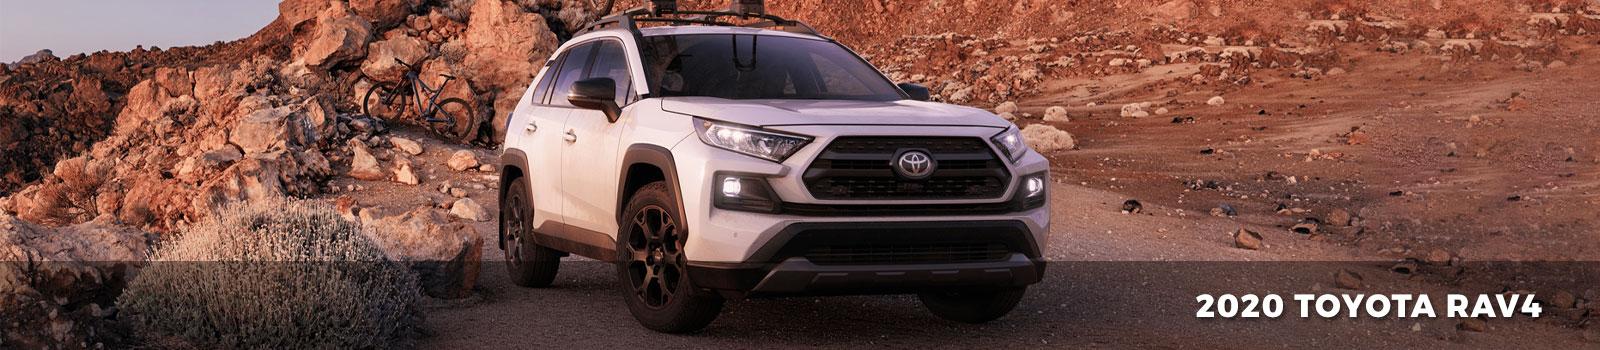 2020 Toyota RAV4 SUV Models For Sale In Tifton, Georgia